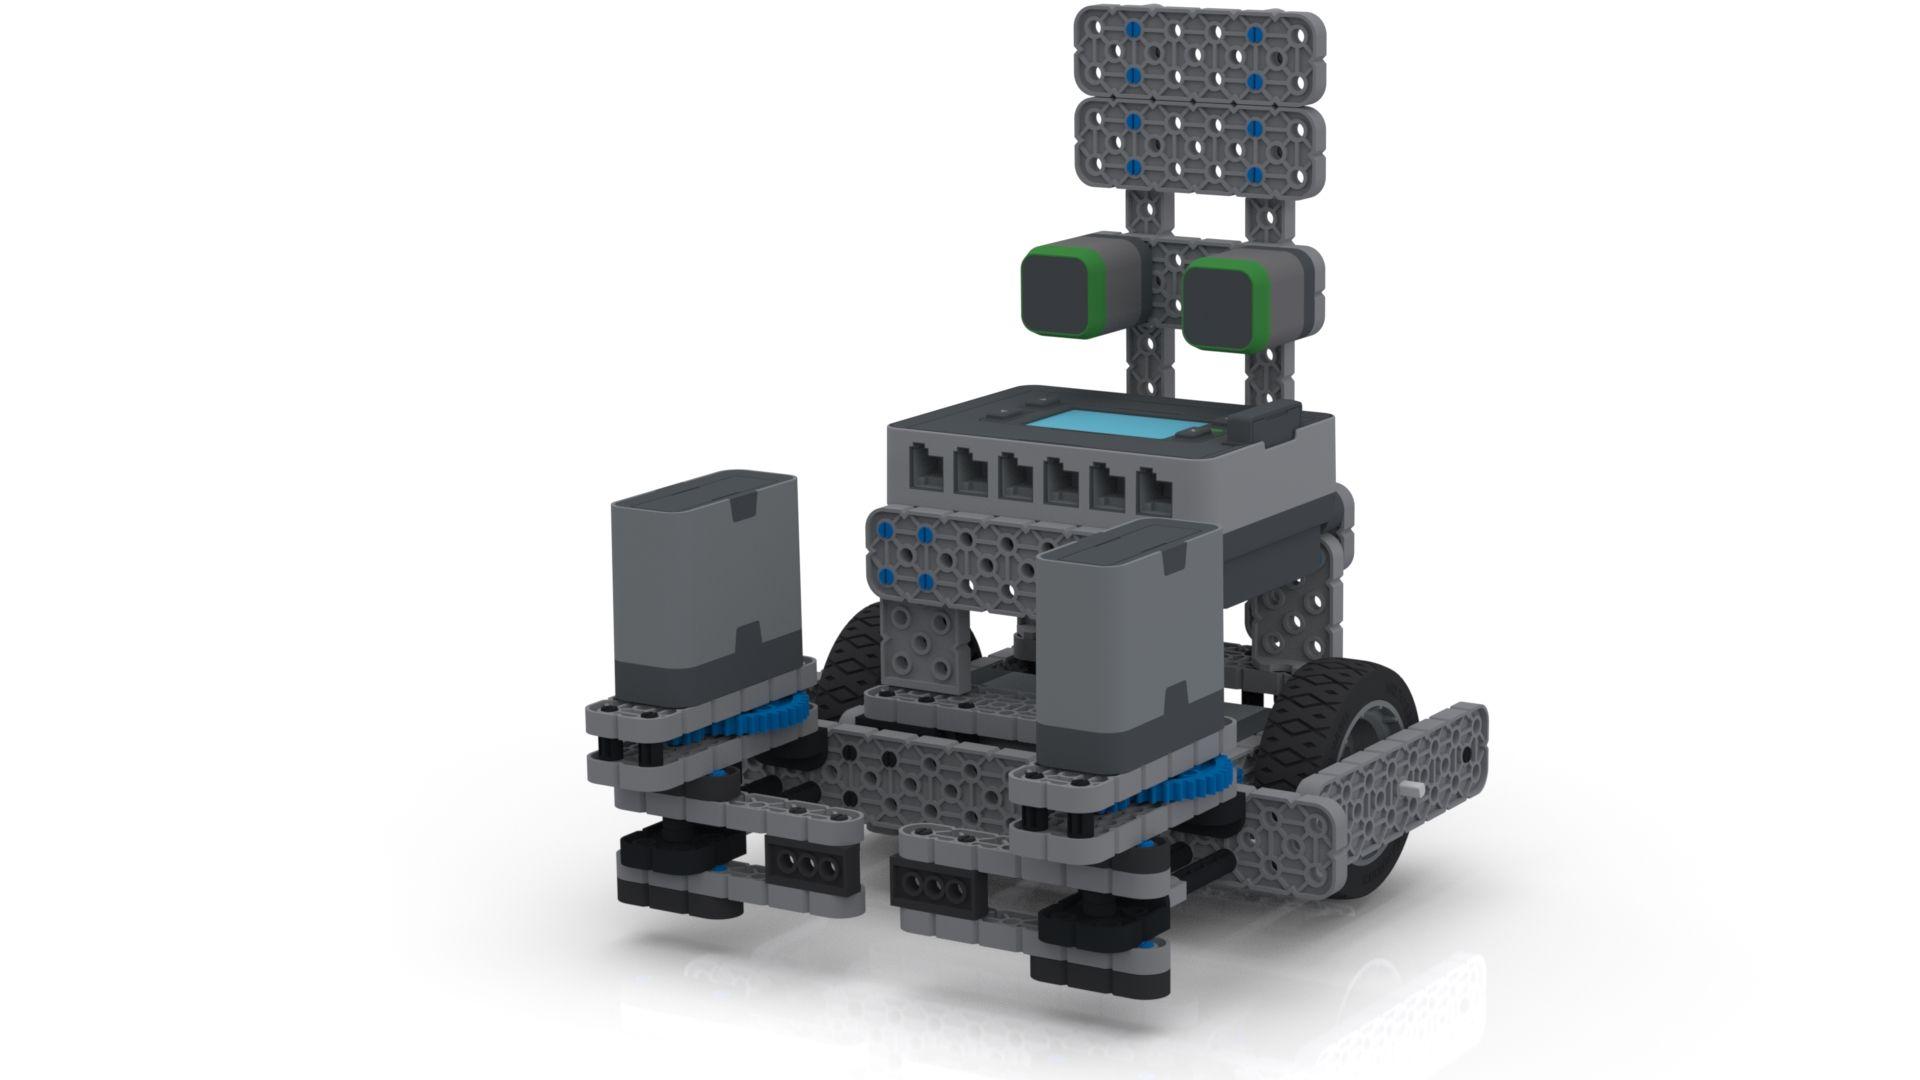 Fabrica-de-nerdes-vex-iq-lucas3-3500-3500